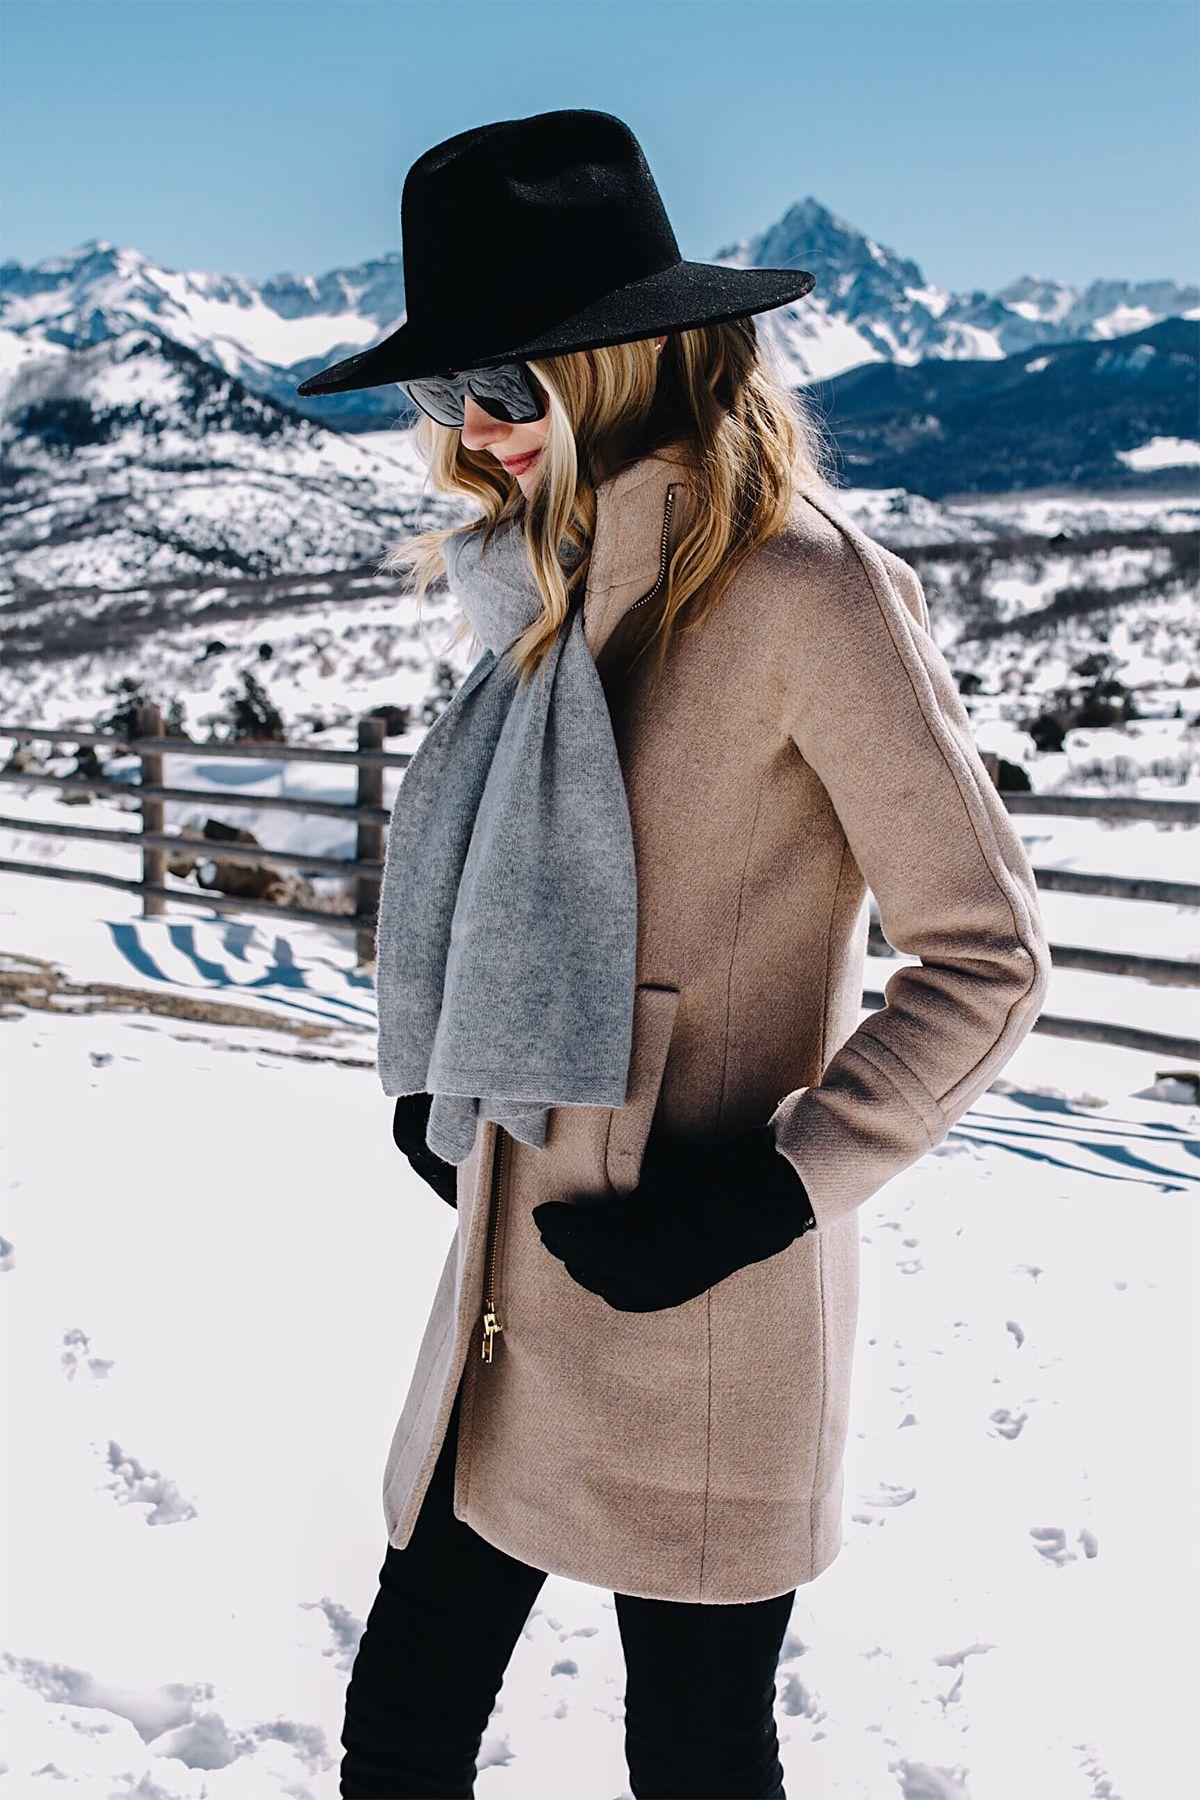 Telluride CO Snow Mountains Blonde Woman Wearing Grey Scarf Camel Coat  Black Wool Hat Black Gloves Fashion Jackson Dallas Blogger Fashion Blogger